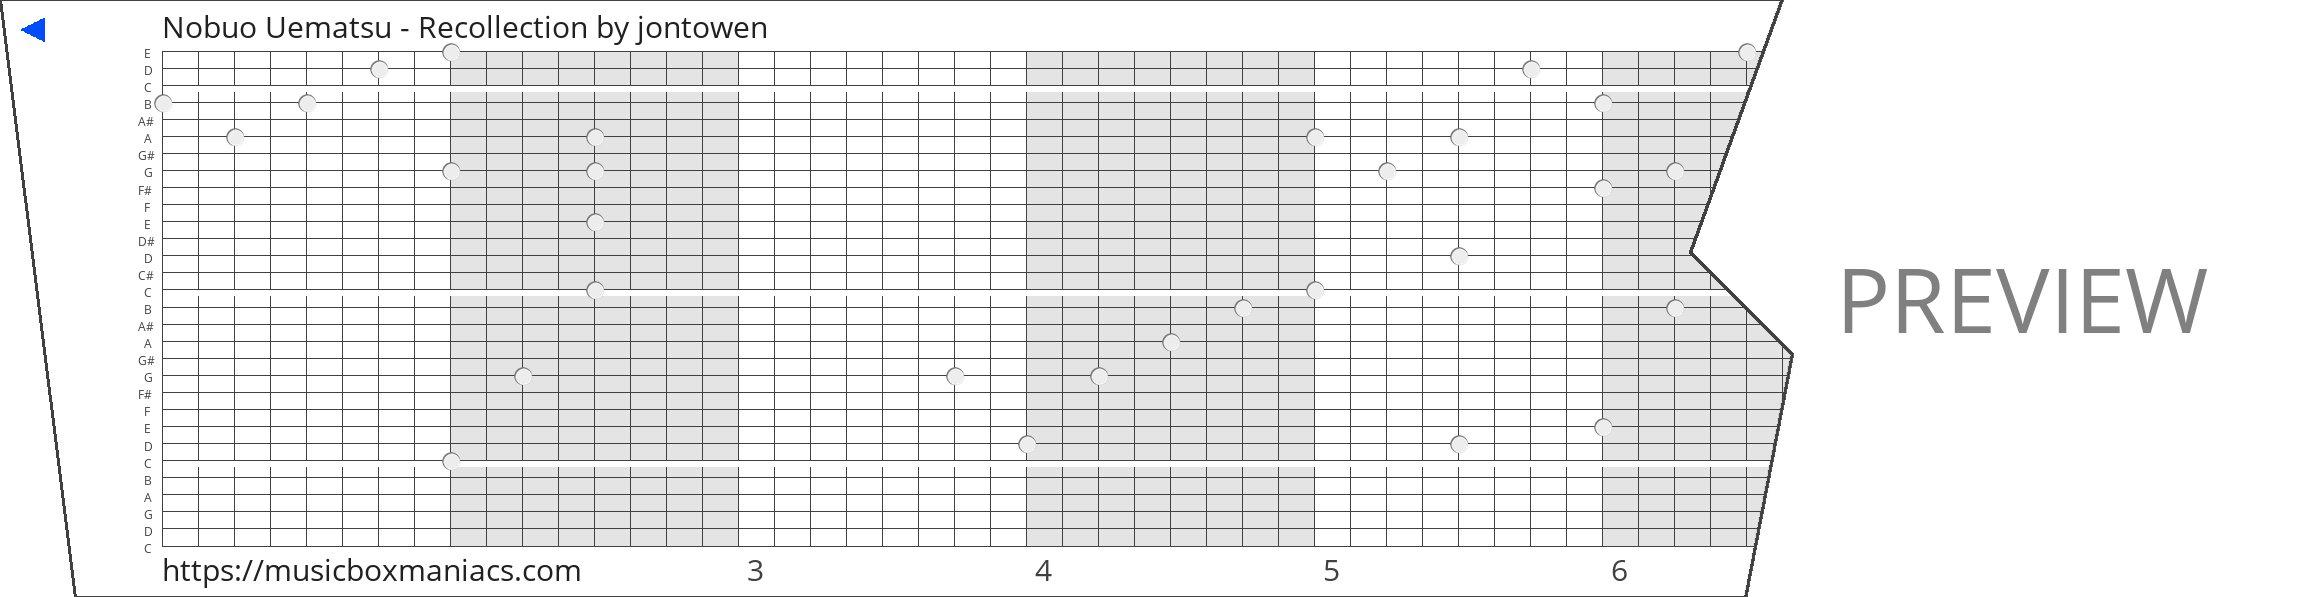 Nobuo Uematsu - Recollection 30 note music box paper strip